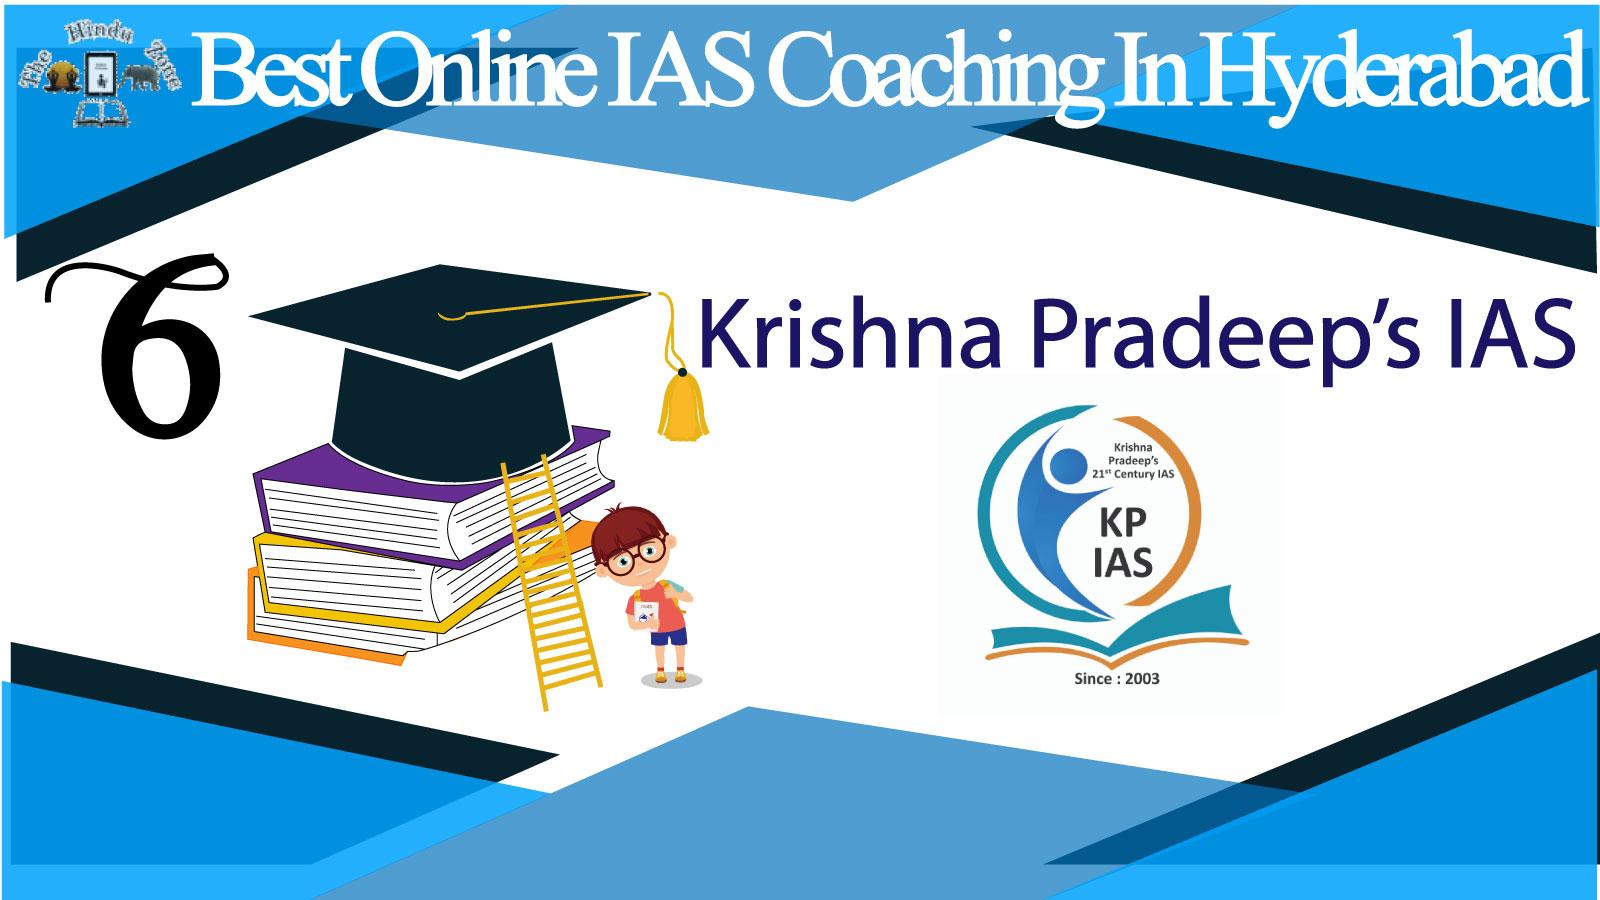 Krishna Pradeep's IAS Coaching in Hyderabad